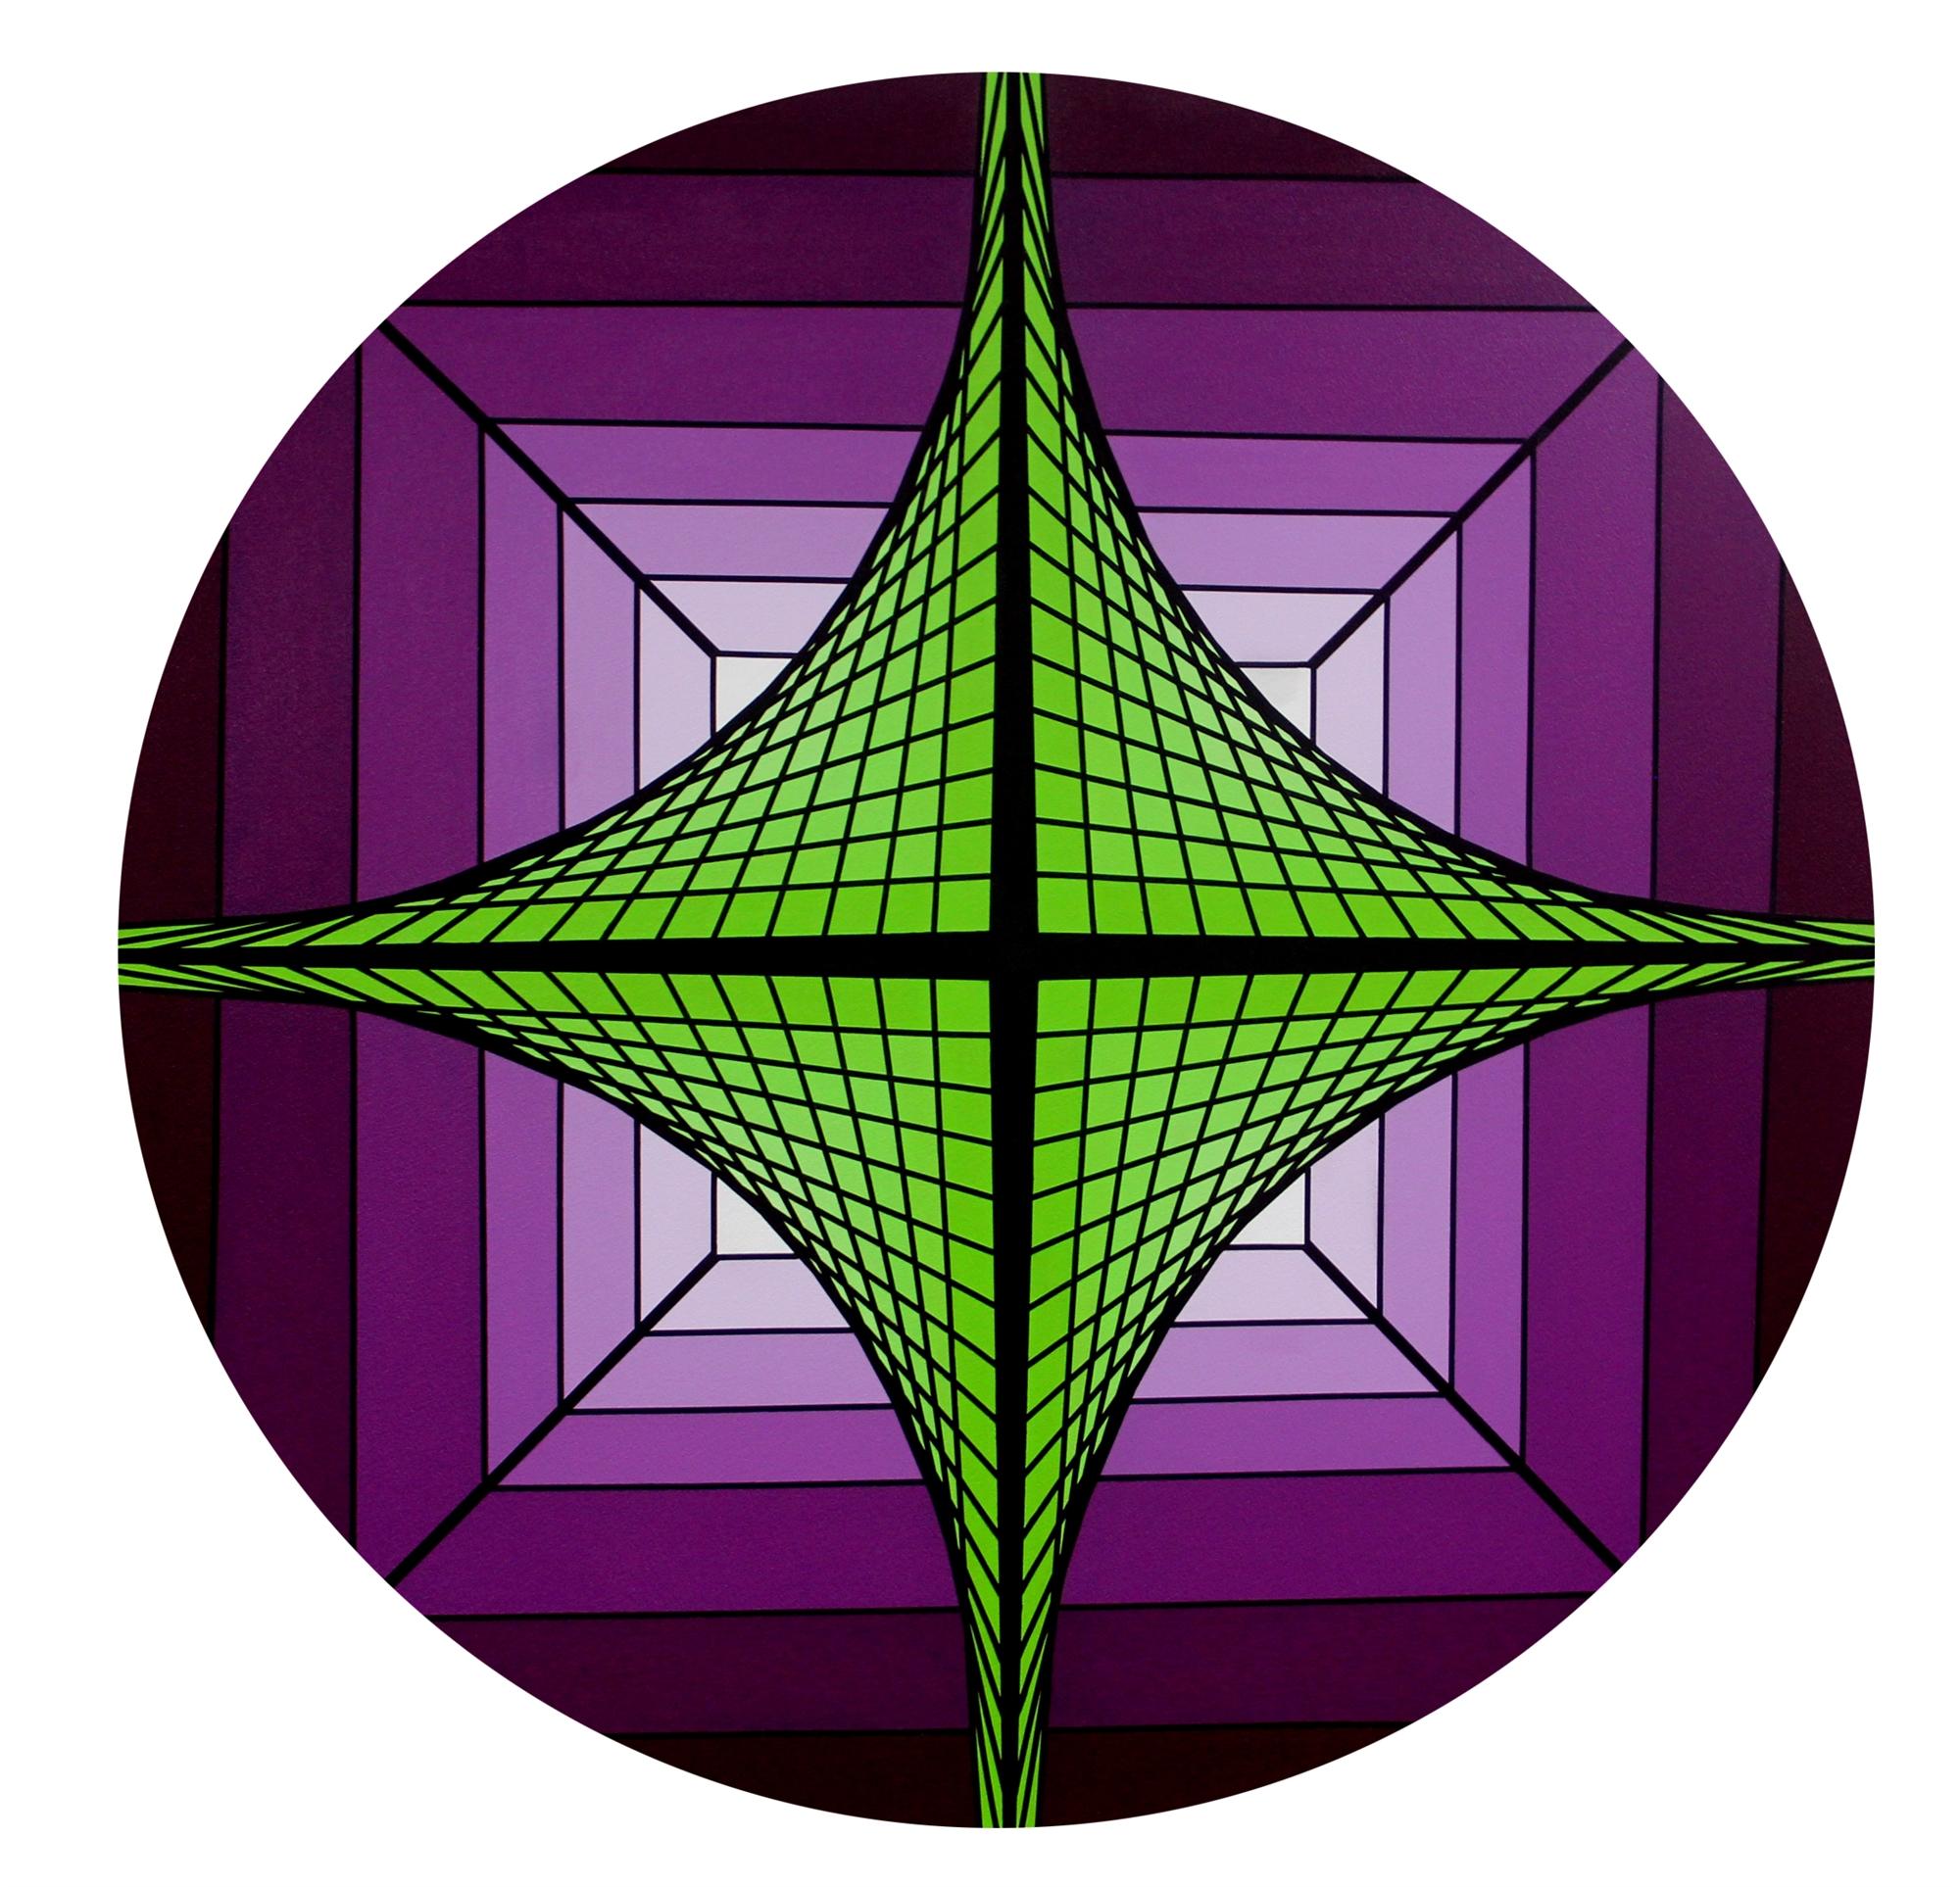 Acid Green Dream by Eric Ockrassa